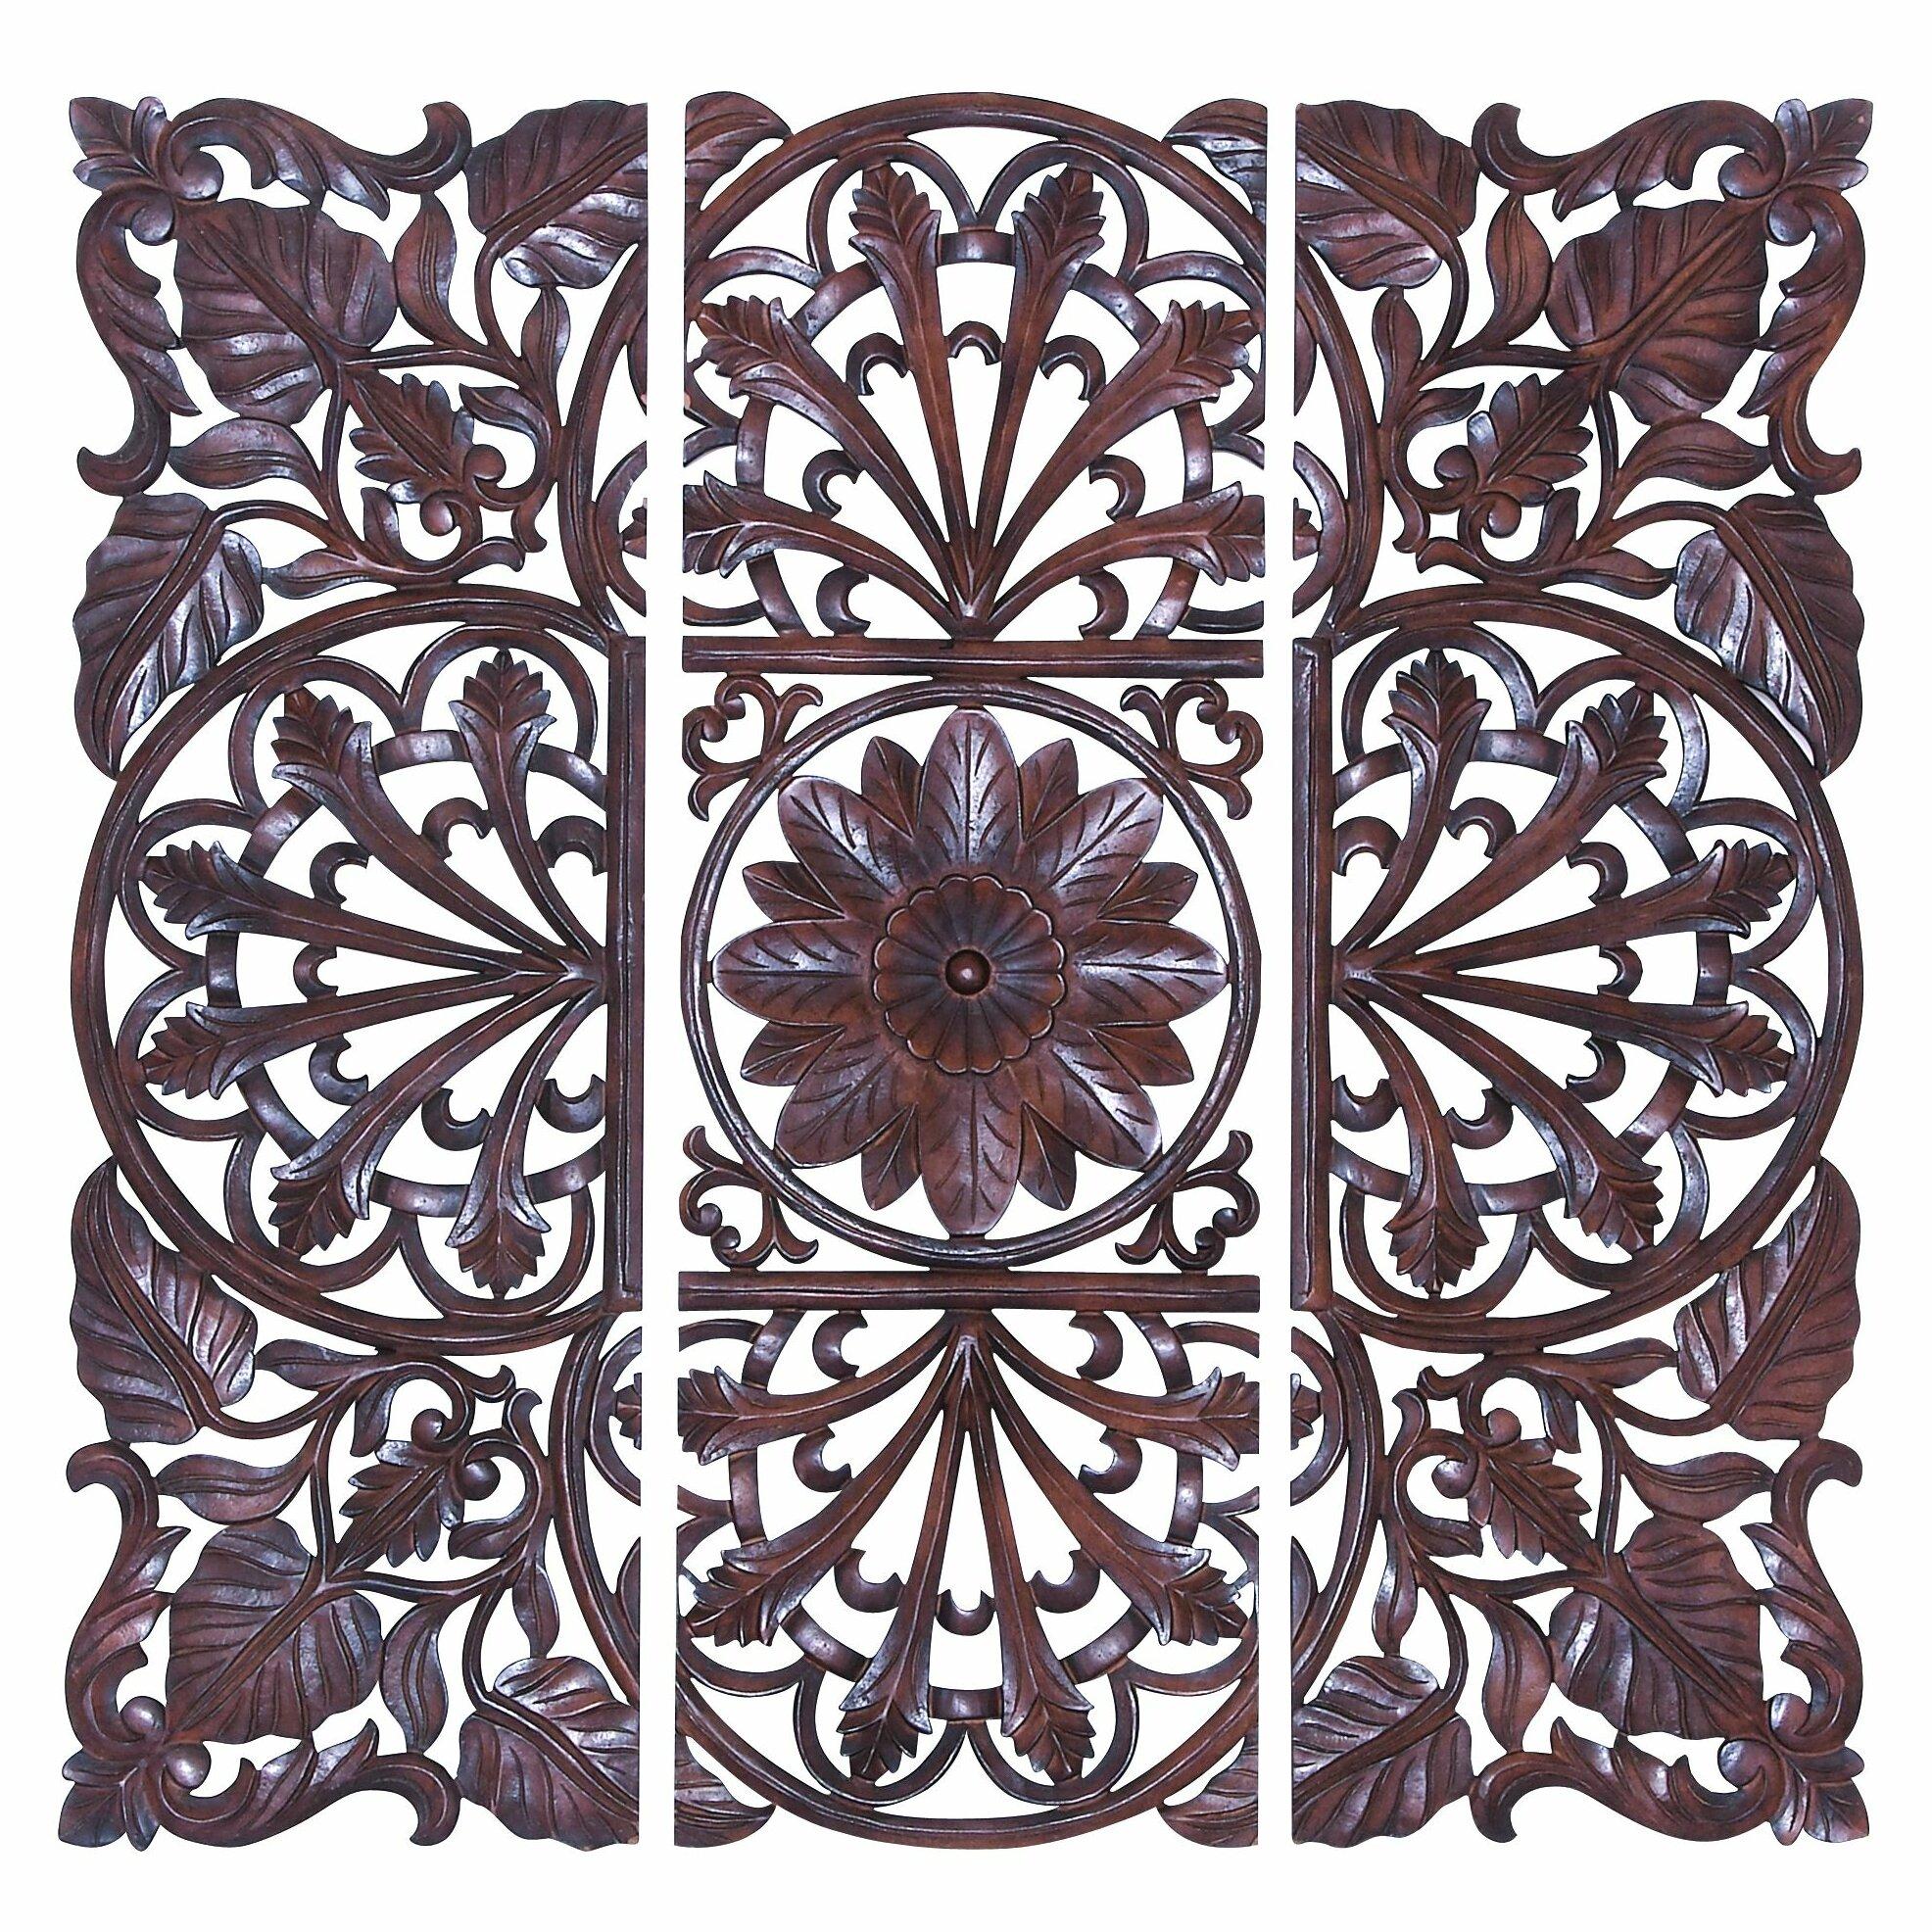 astoria grand 3 piece wall d cor set reviews wayfair. Black Bedroom Furniture Sets. Home Design Ideas